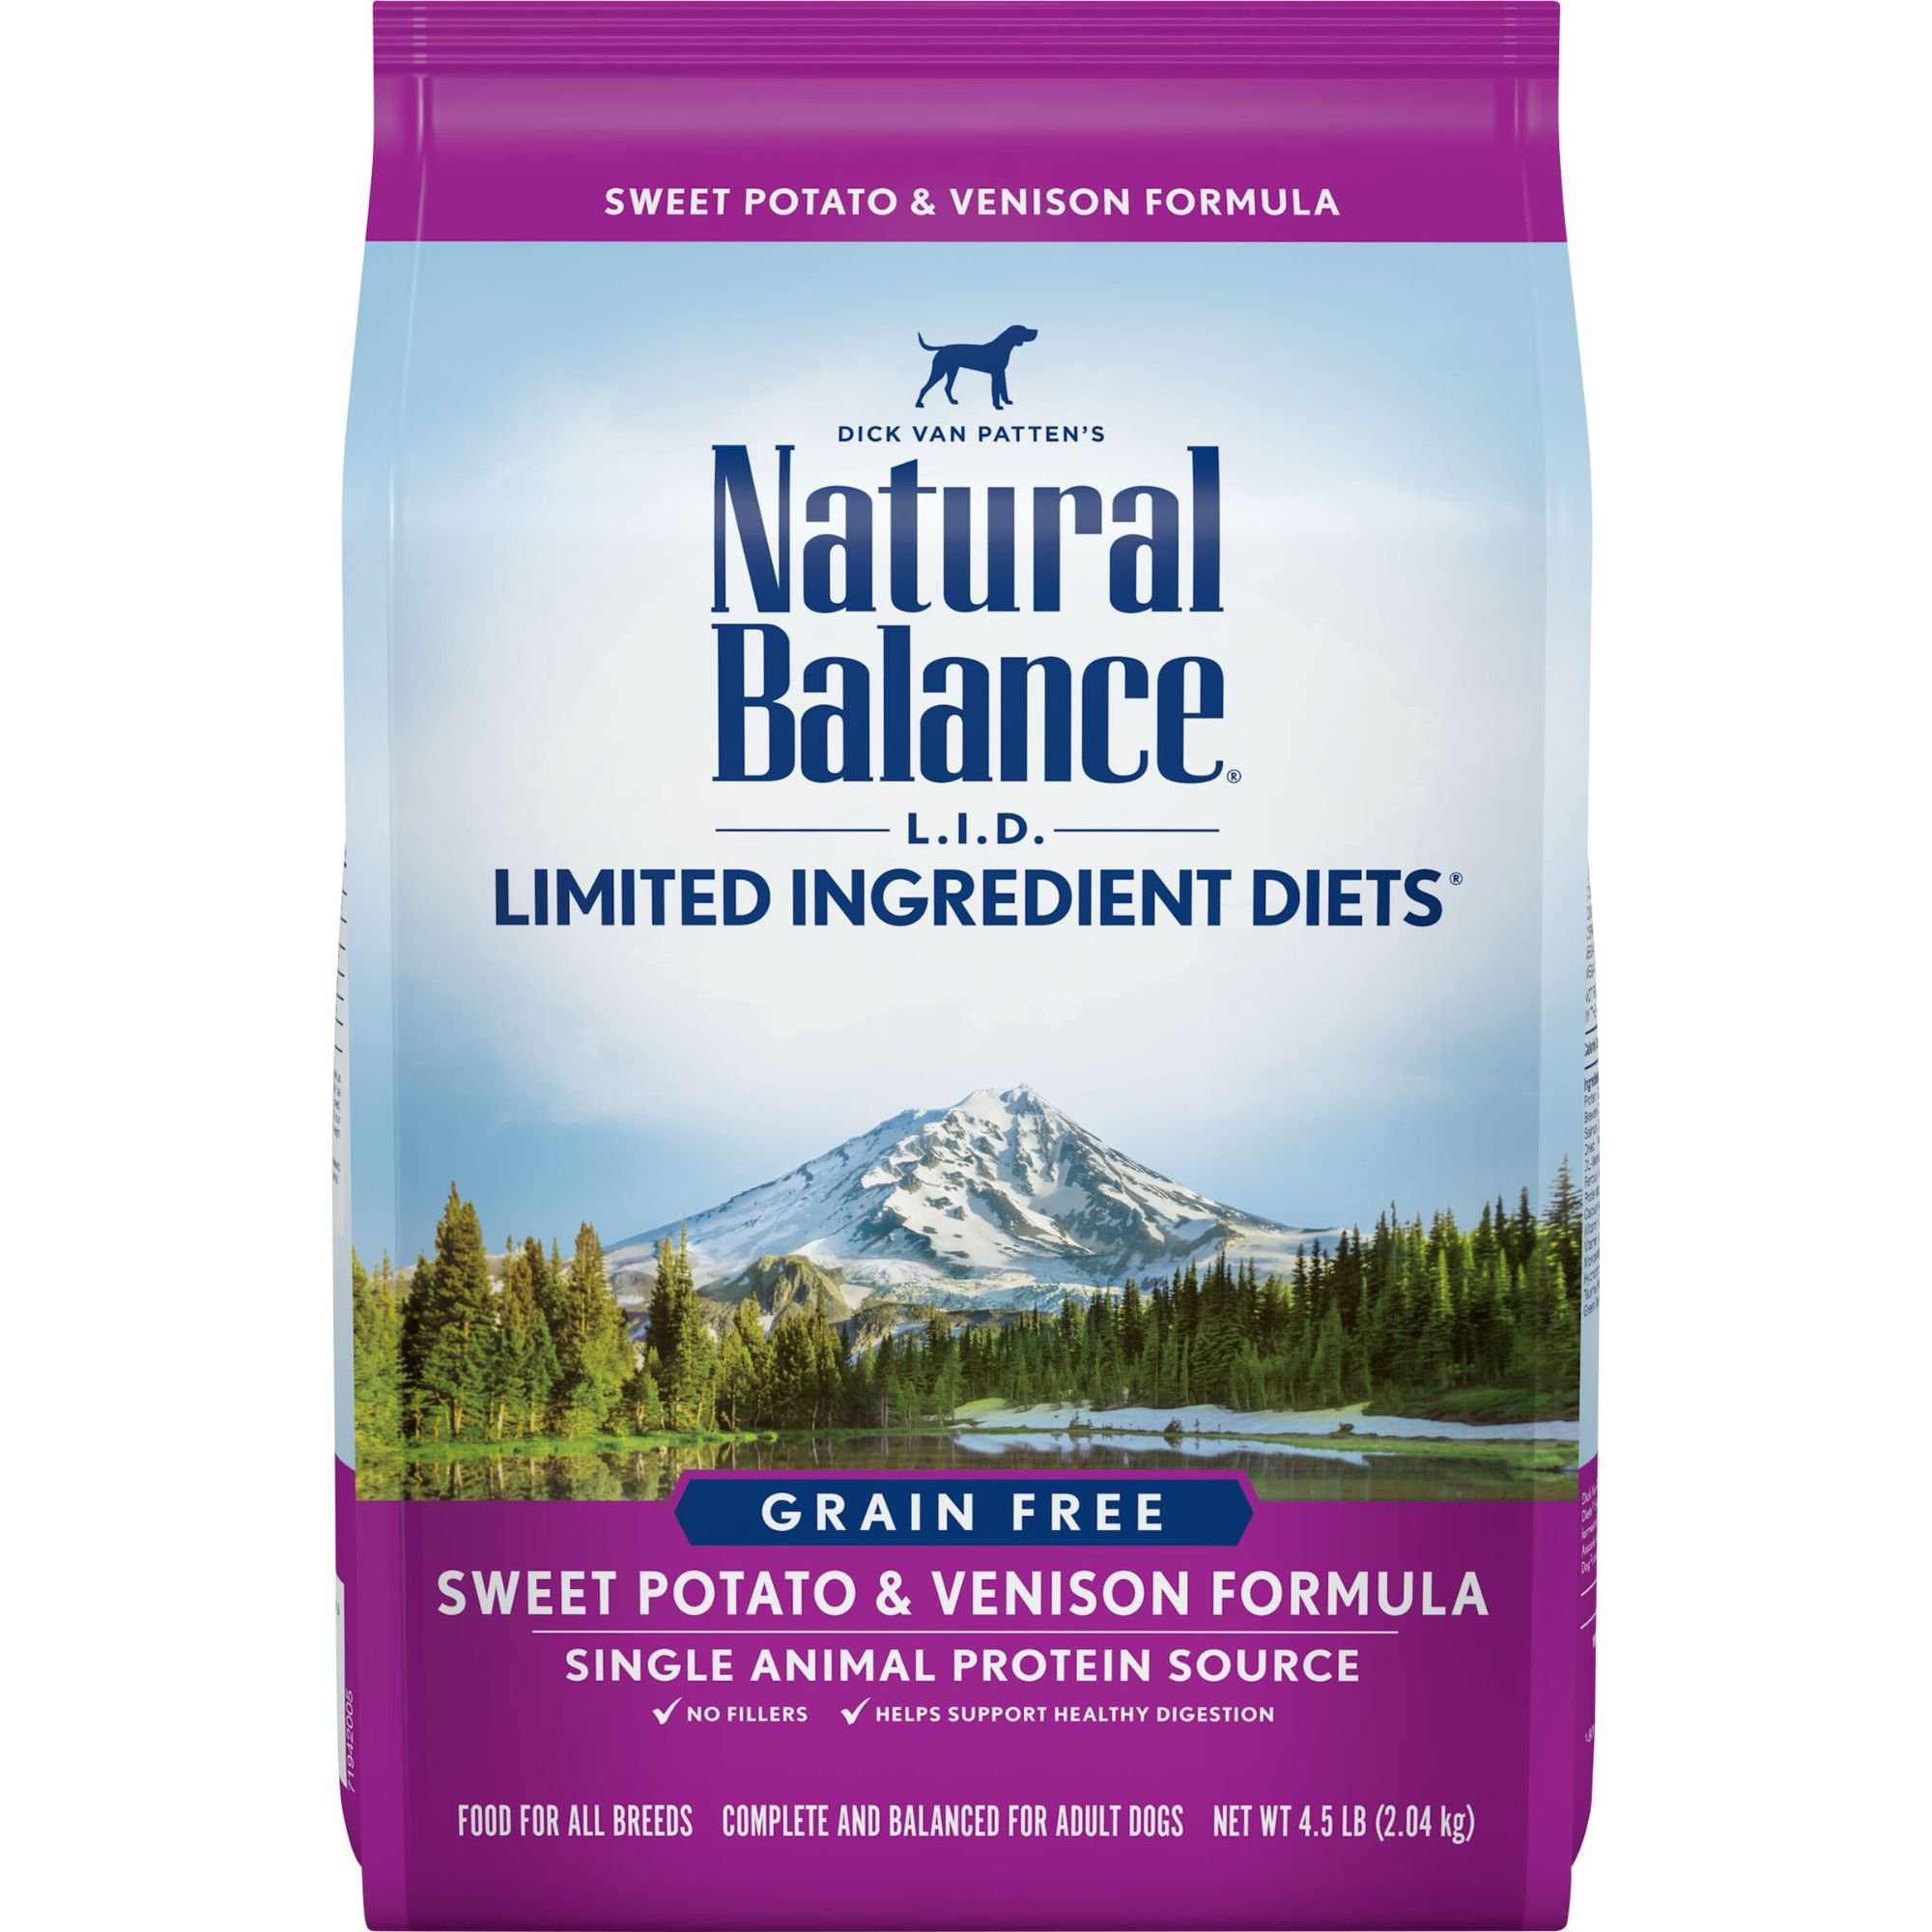 Natural Balance L.I.D. Limited Ingredients Diets Sweet Potato & Venison Dog Food